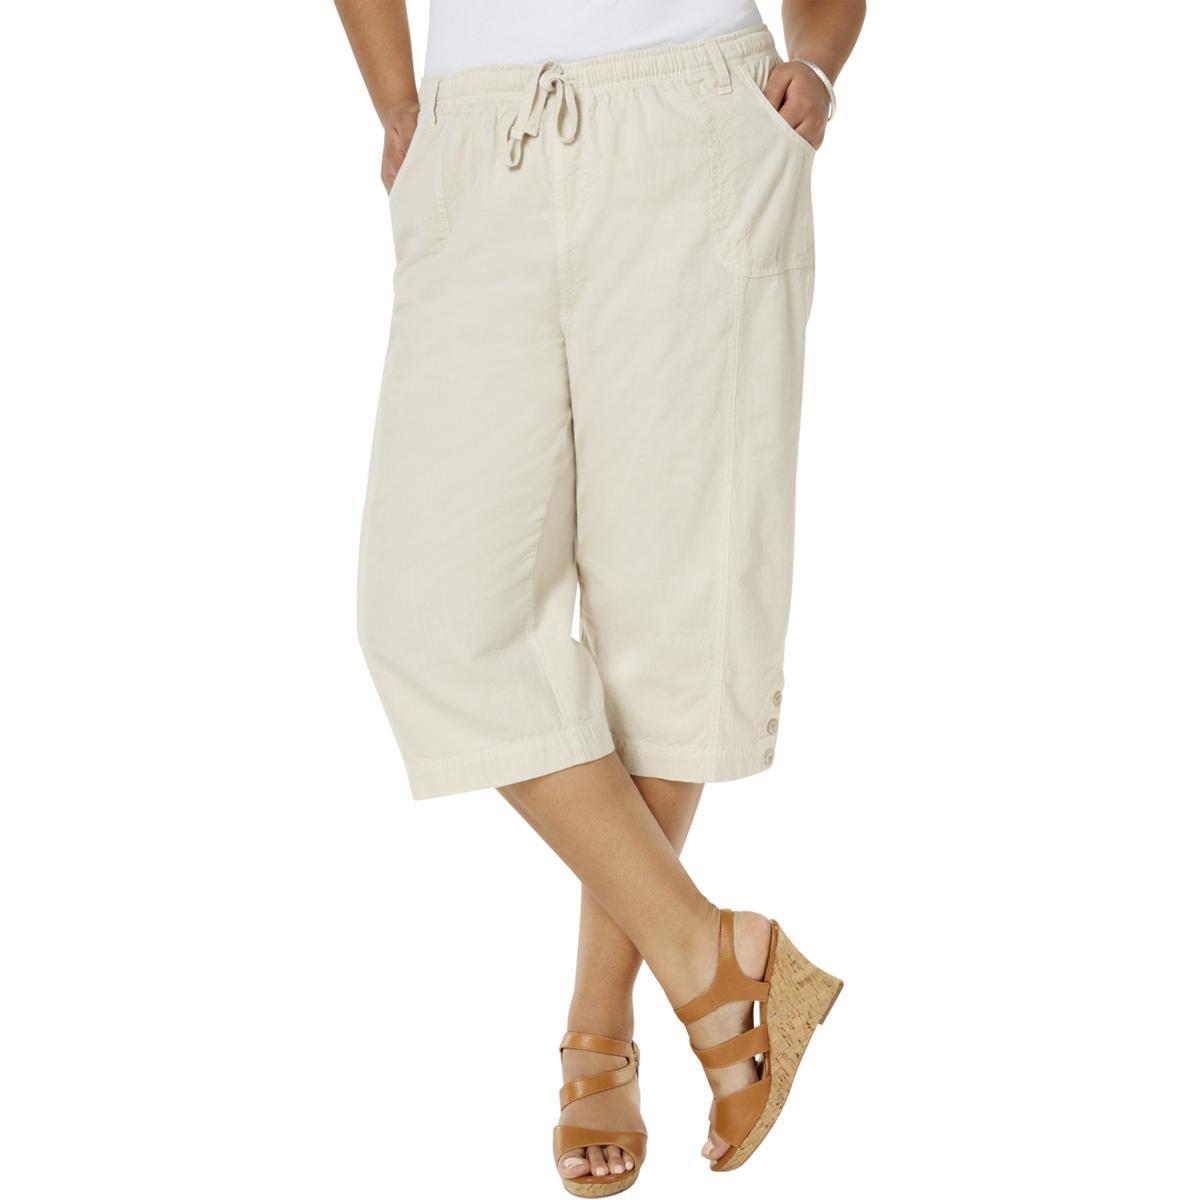 4583987727 Amazon.com: Karen Scott Womens Plus Cotton Crop Capri Pants Tan 0X: Clothing